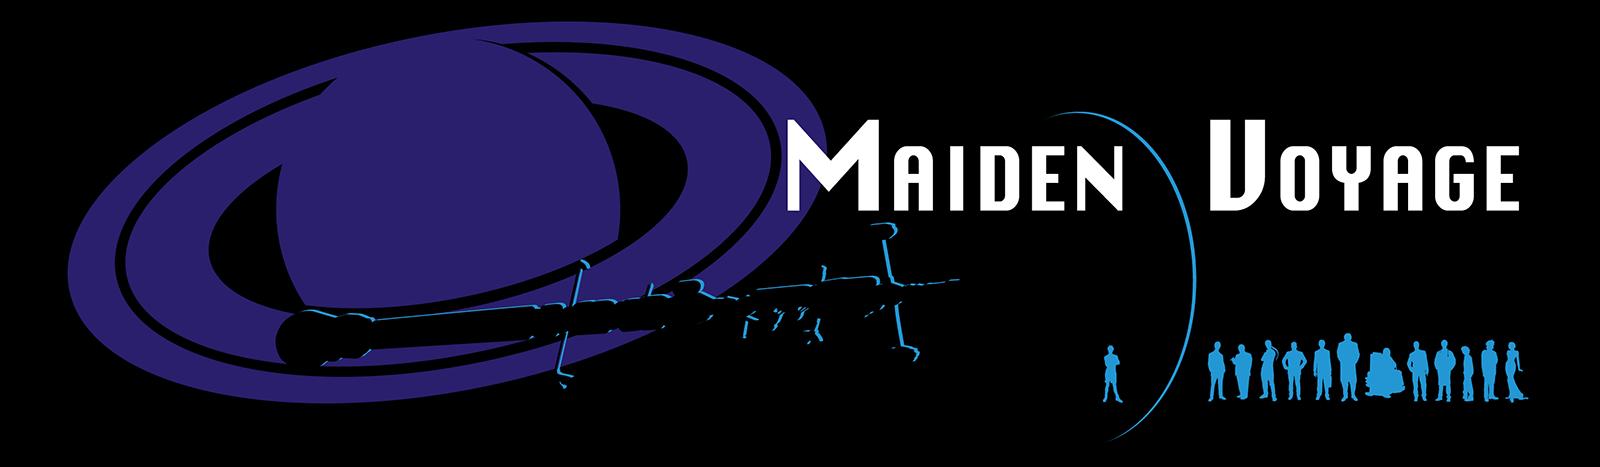 Maiden Voyage Continuity